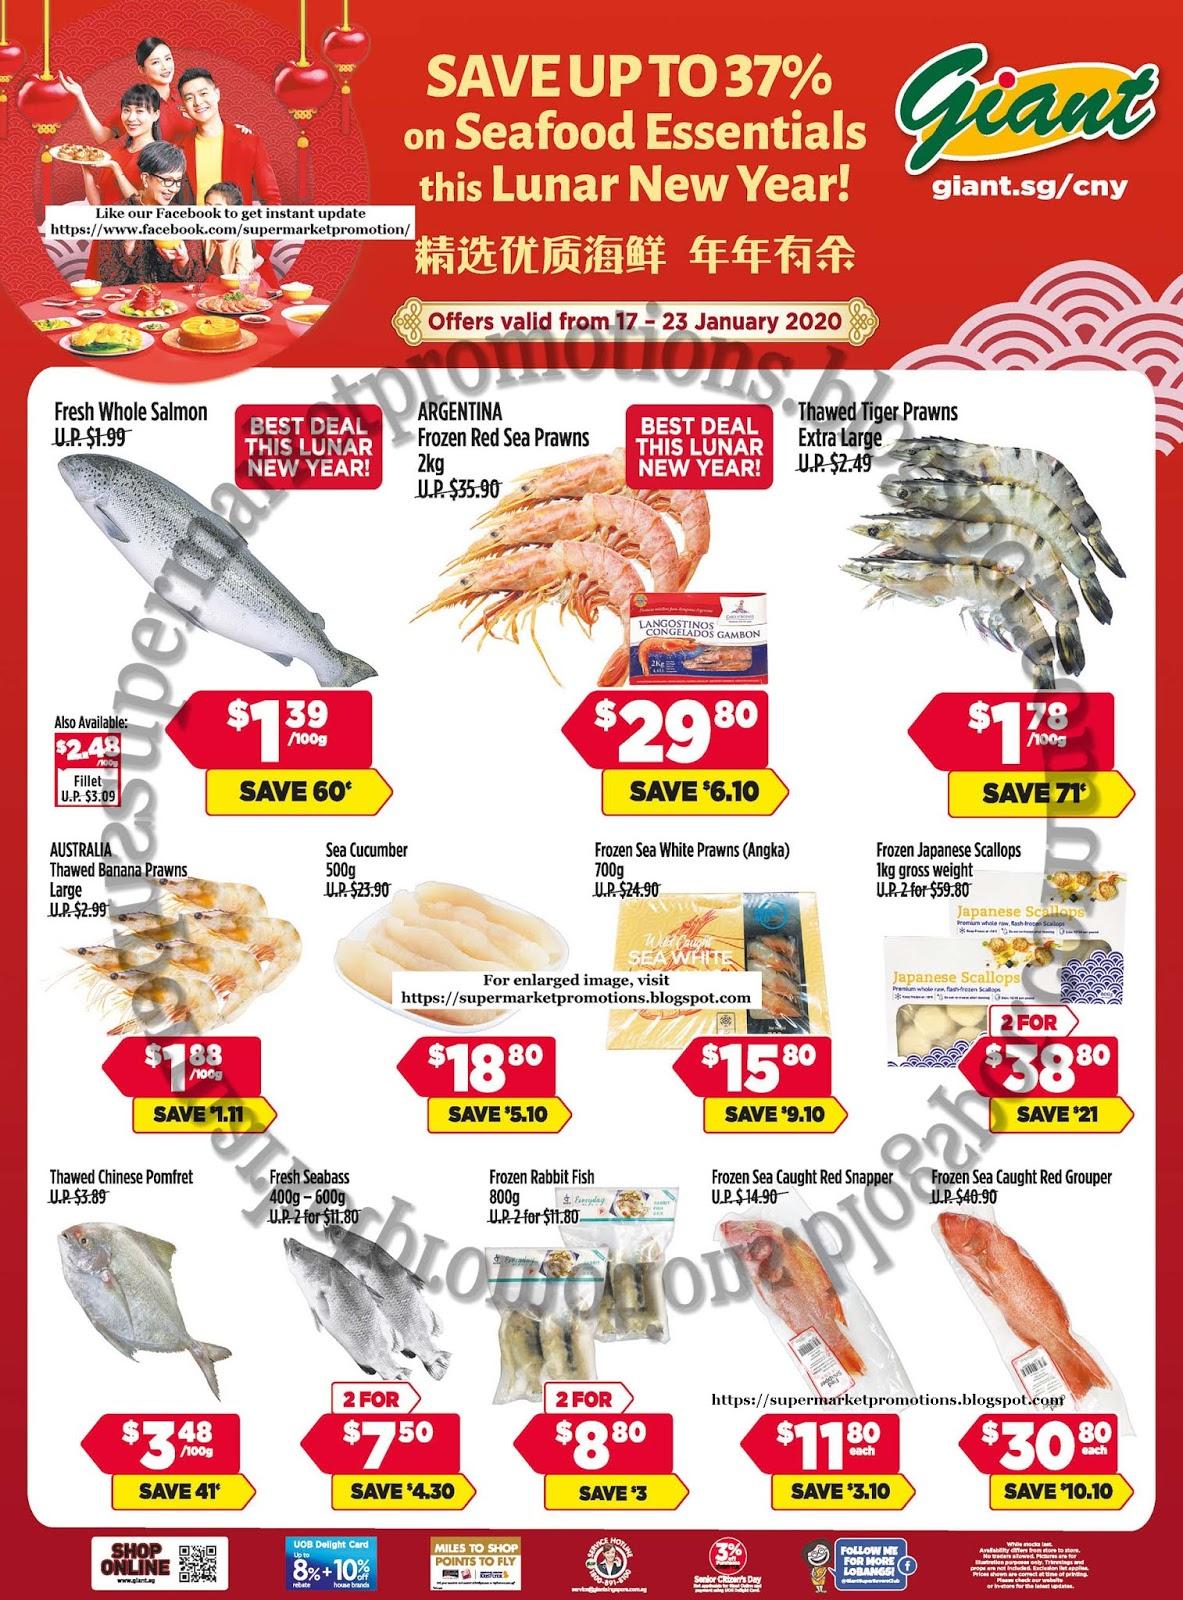 Giant CNY Seafood Promotion 17 - 23 January 2020 ...